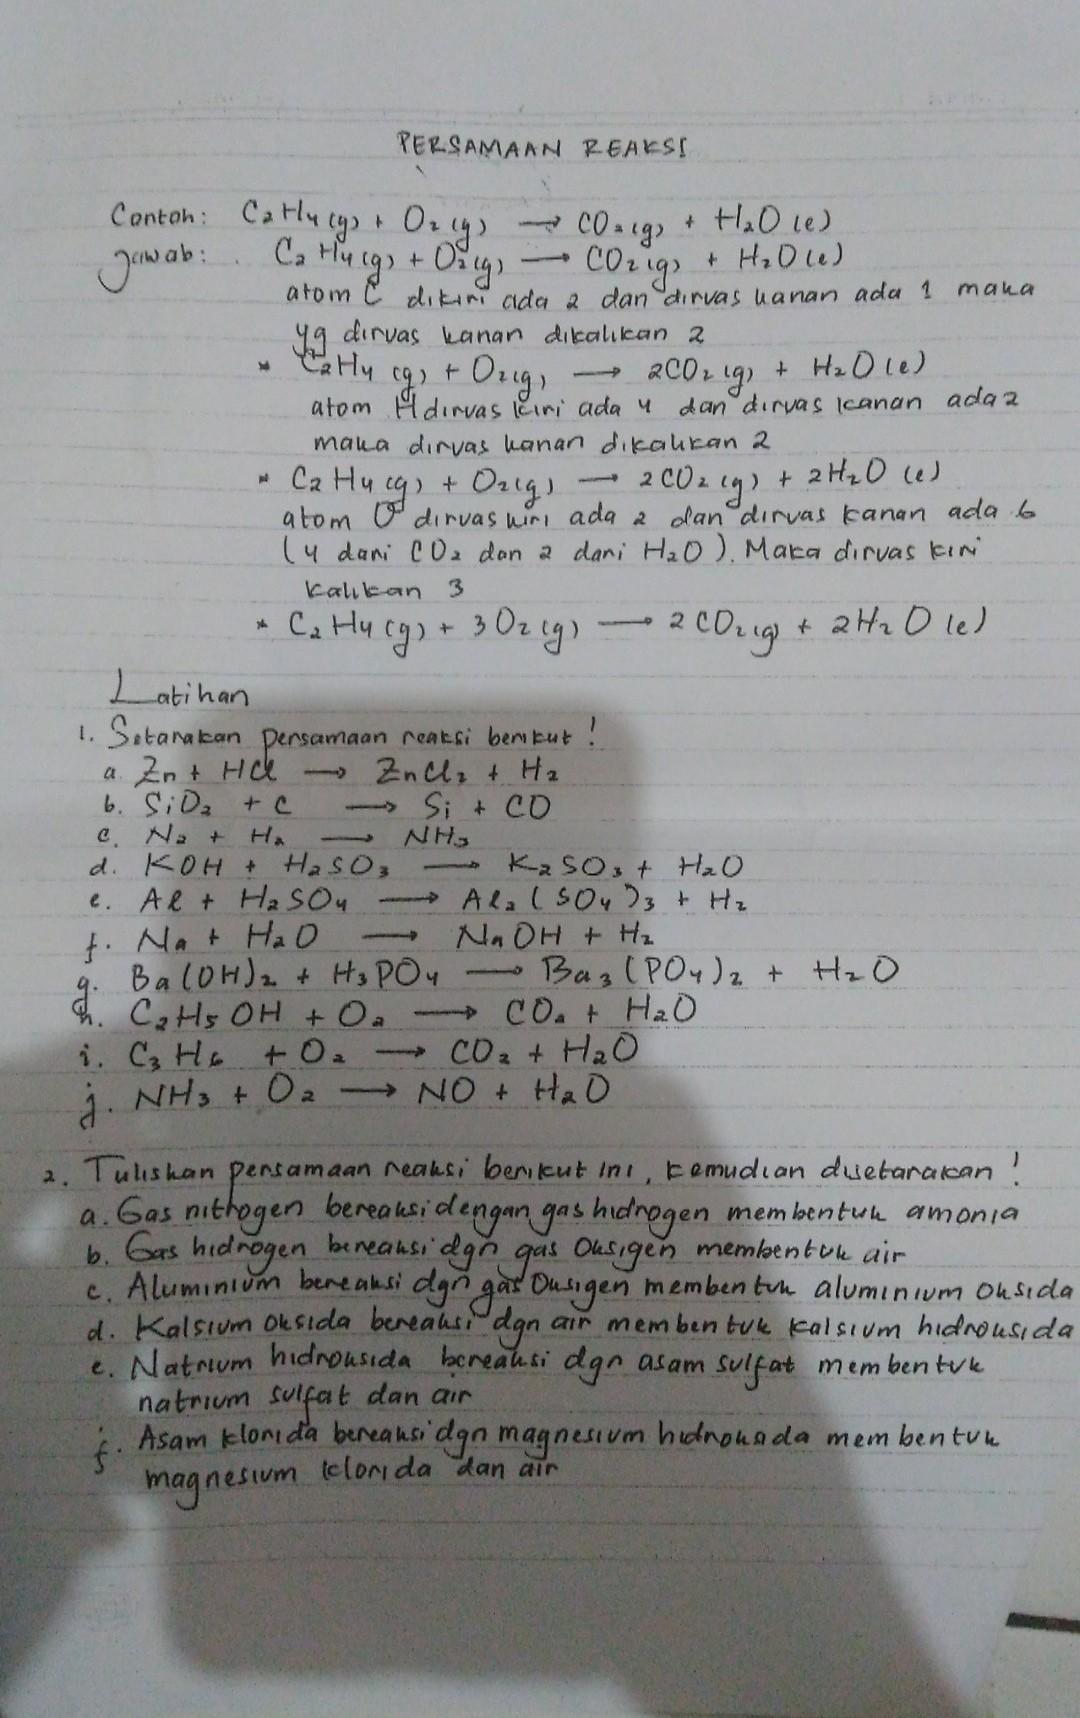 Contoh Soal Kimia Kelas 10 : contoh, kimia, kelas, Tolong, Bantu, Kimia, Kelas, Materi, Persamaan, Reaksi.., Brainly.co.id